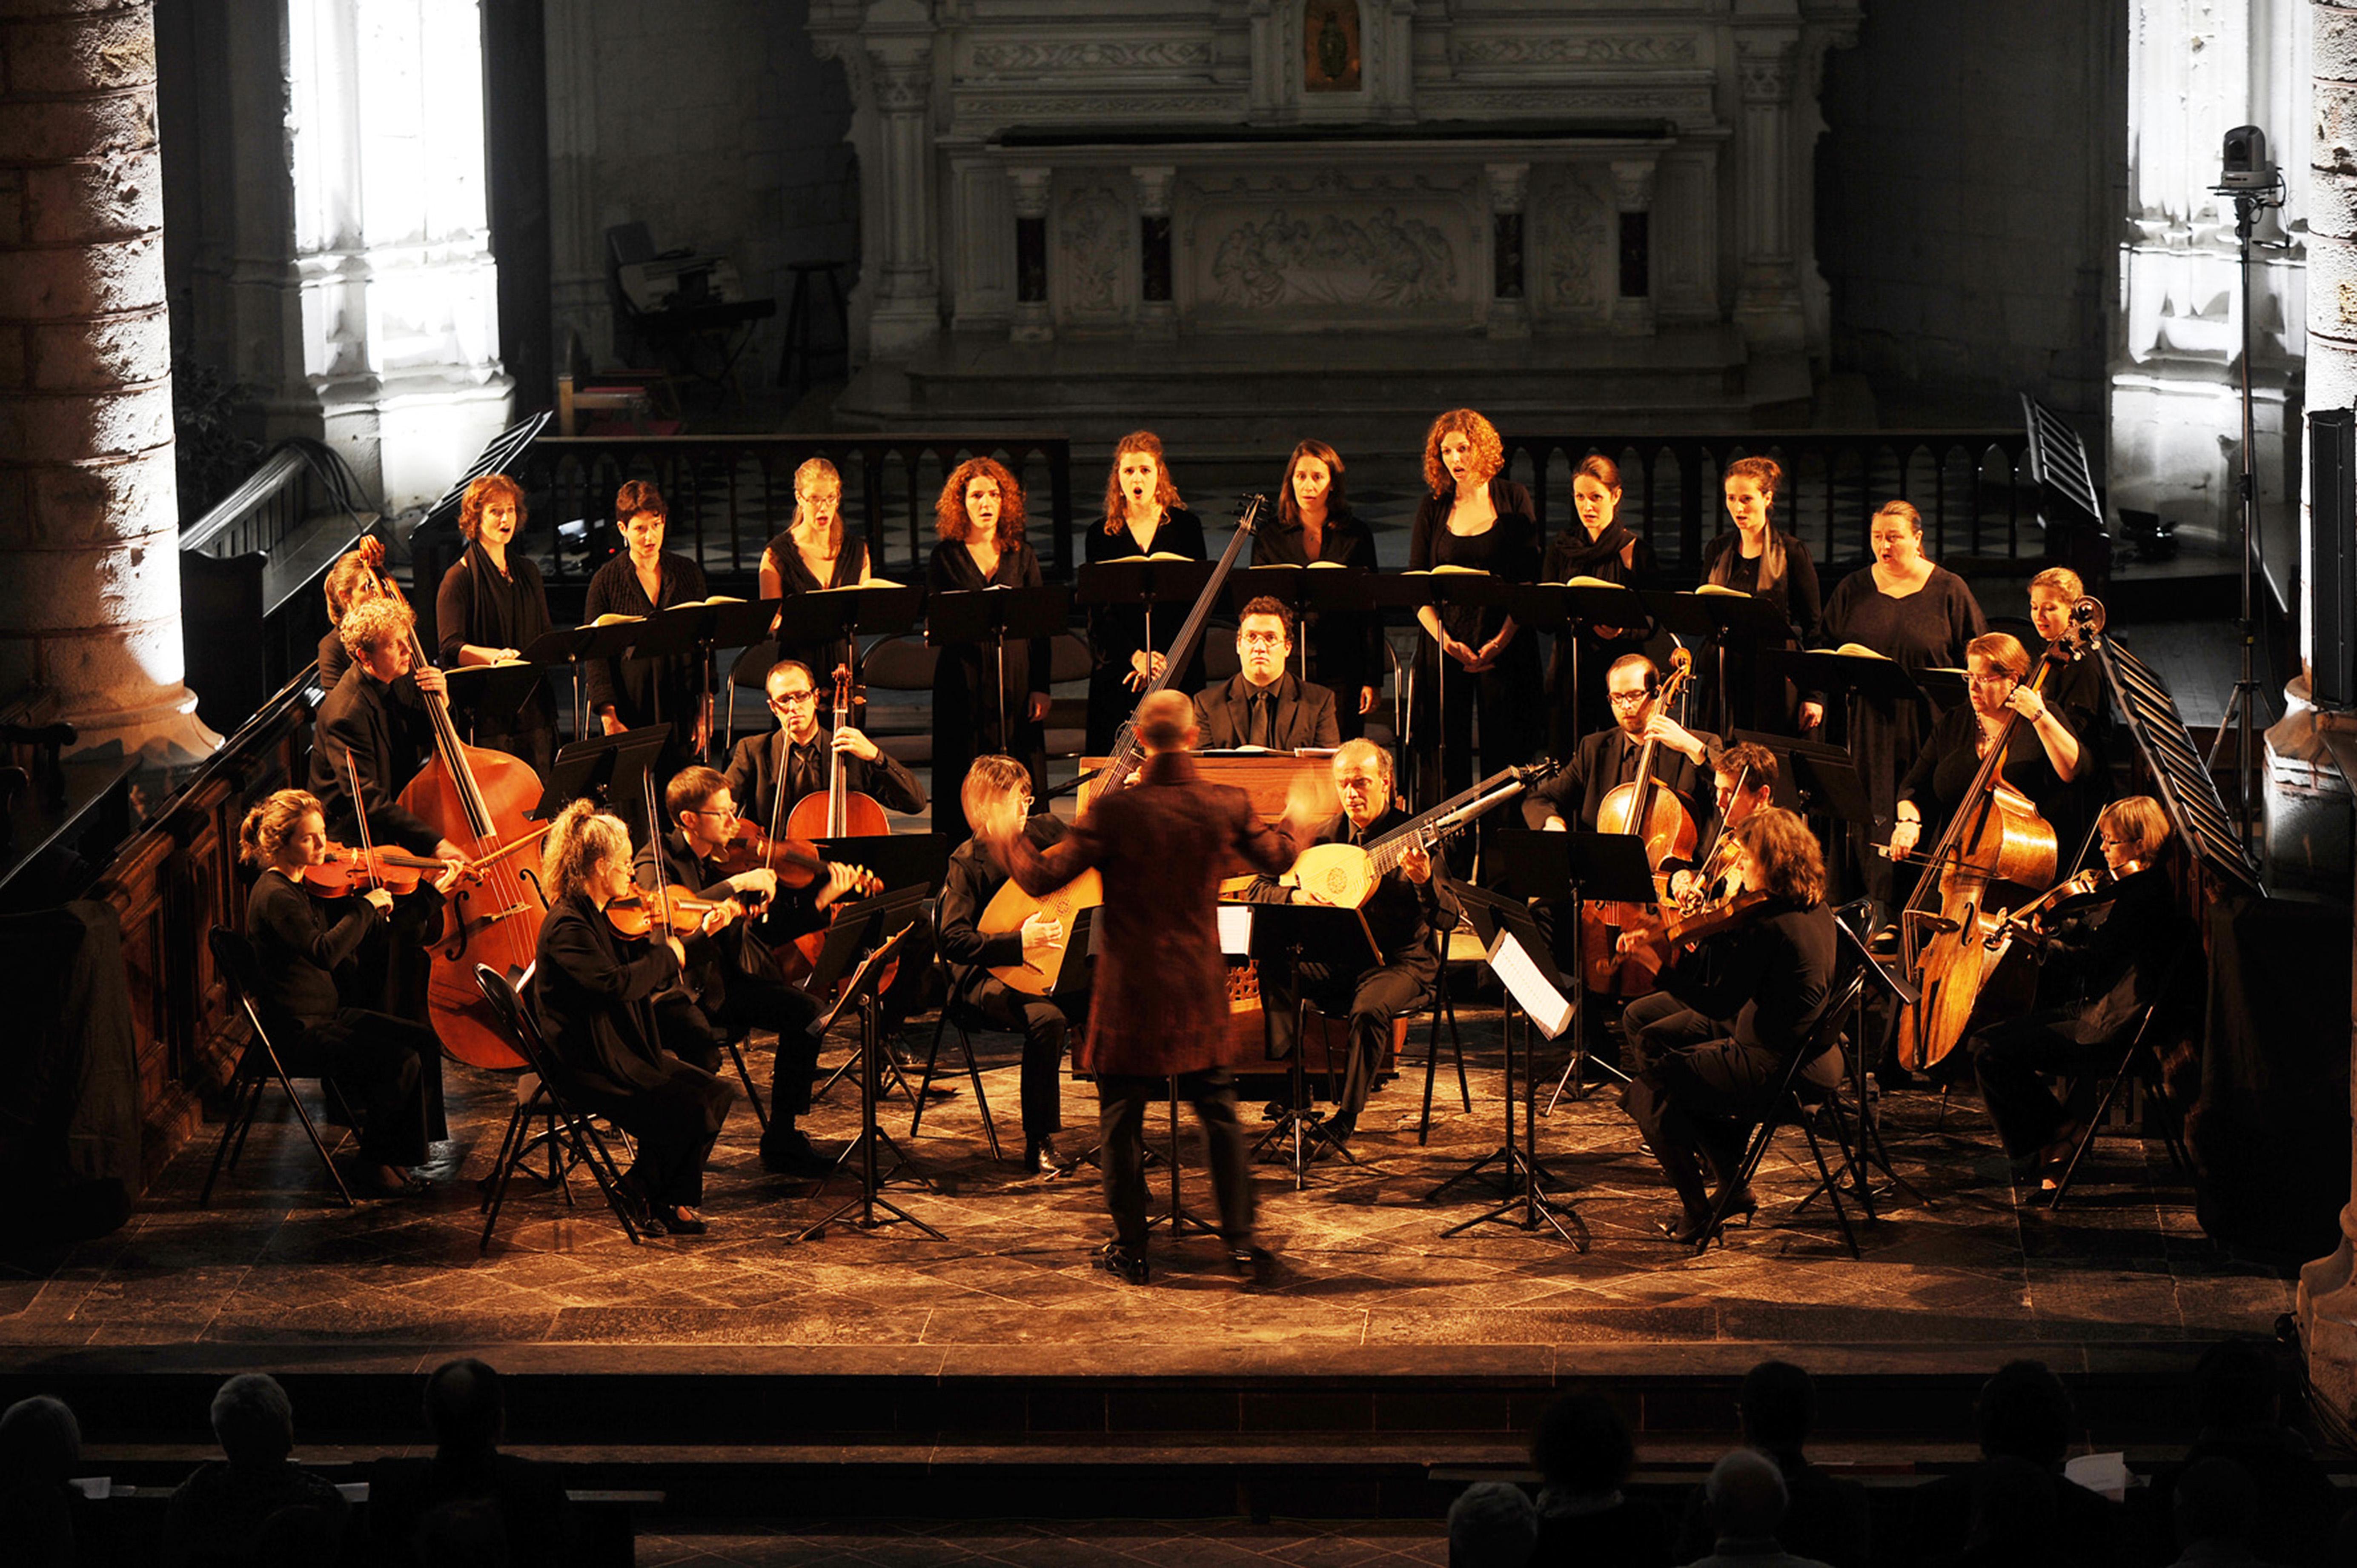 Rocamadour-Vivaldi_auxi_2011-4-copyright-pascal-brunet